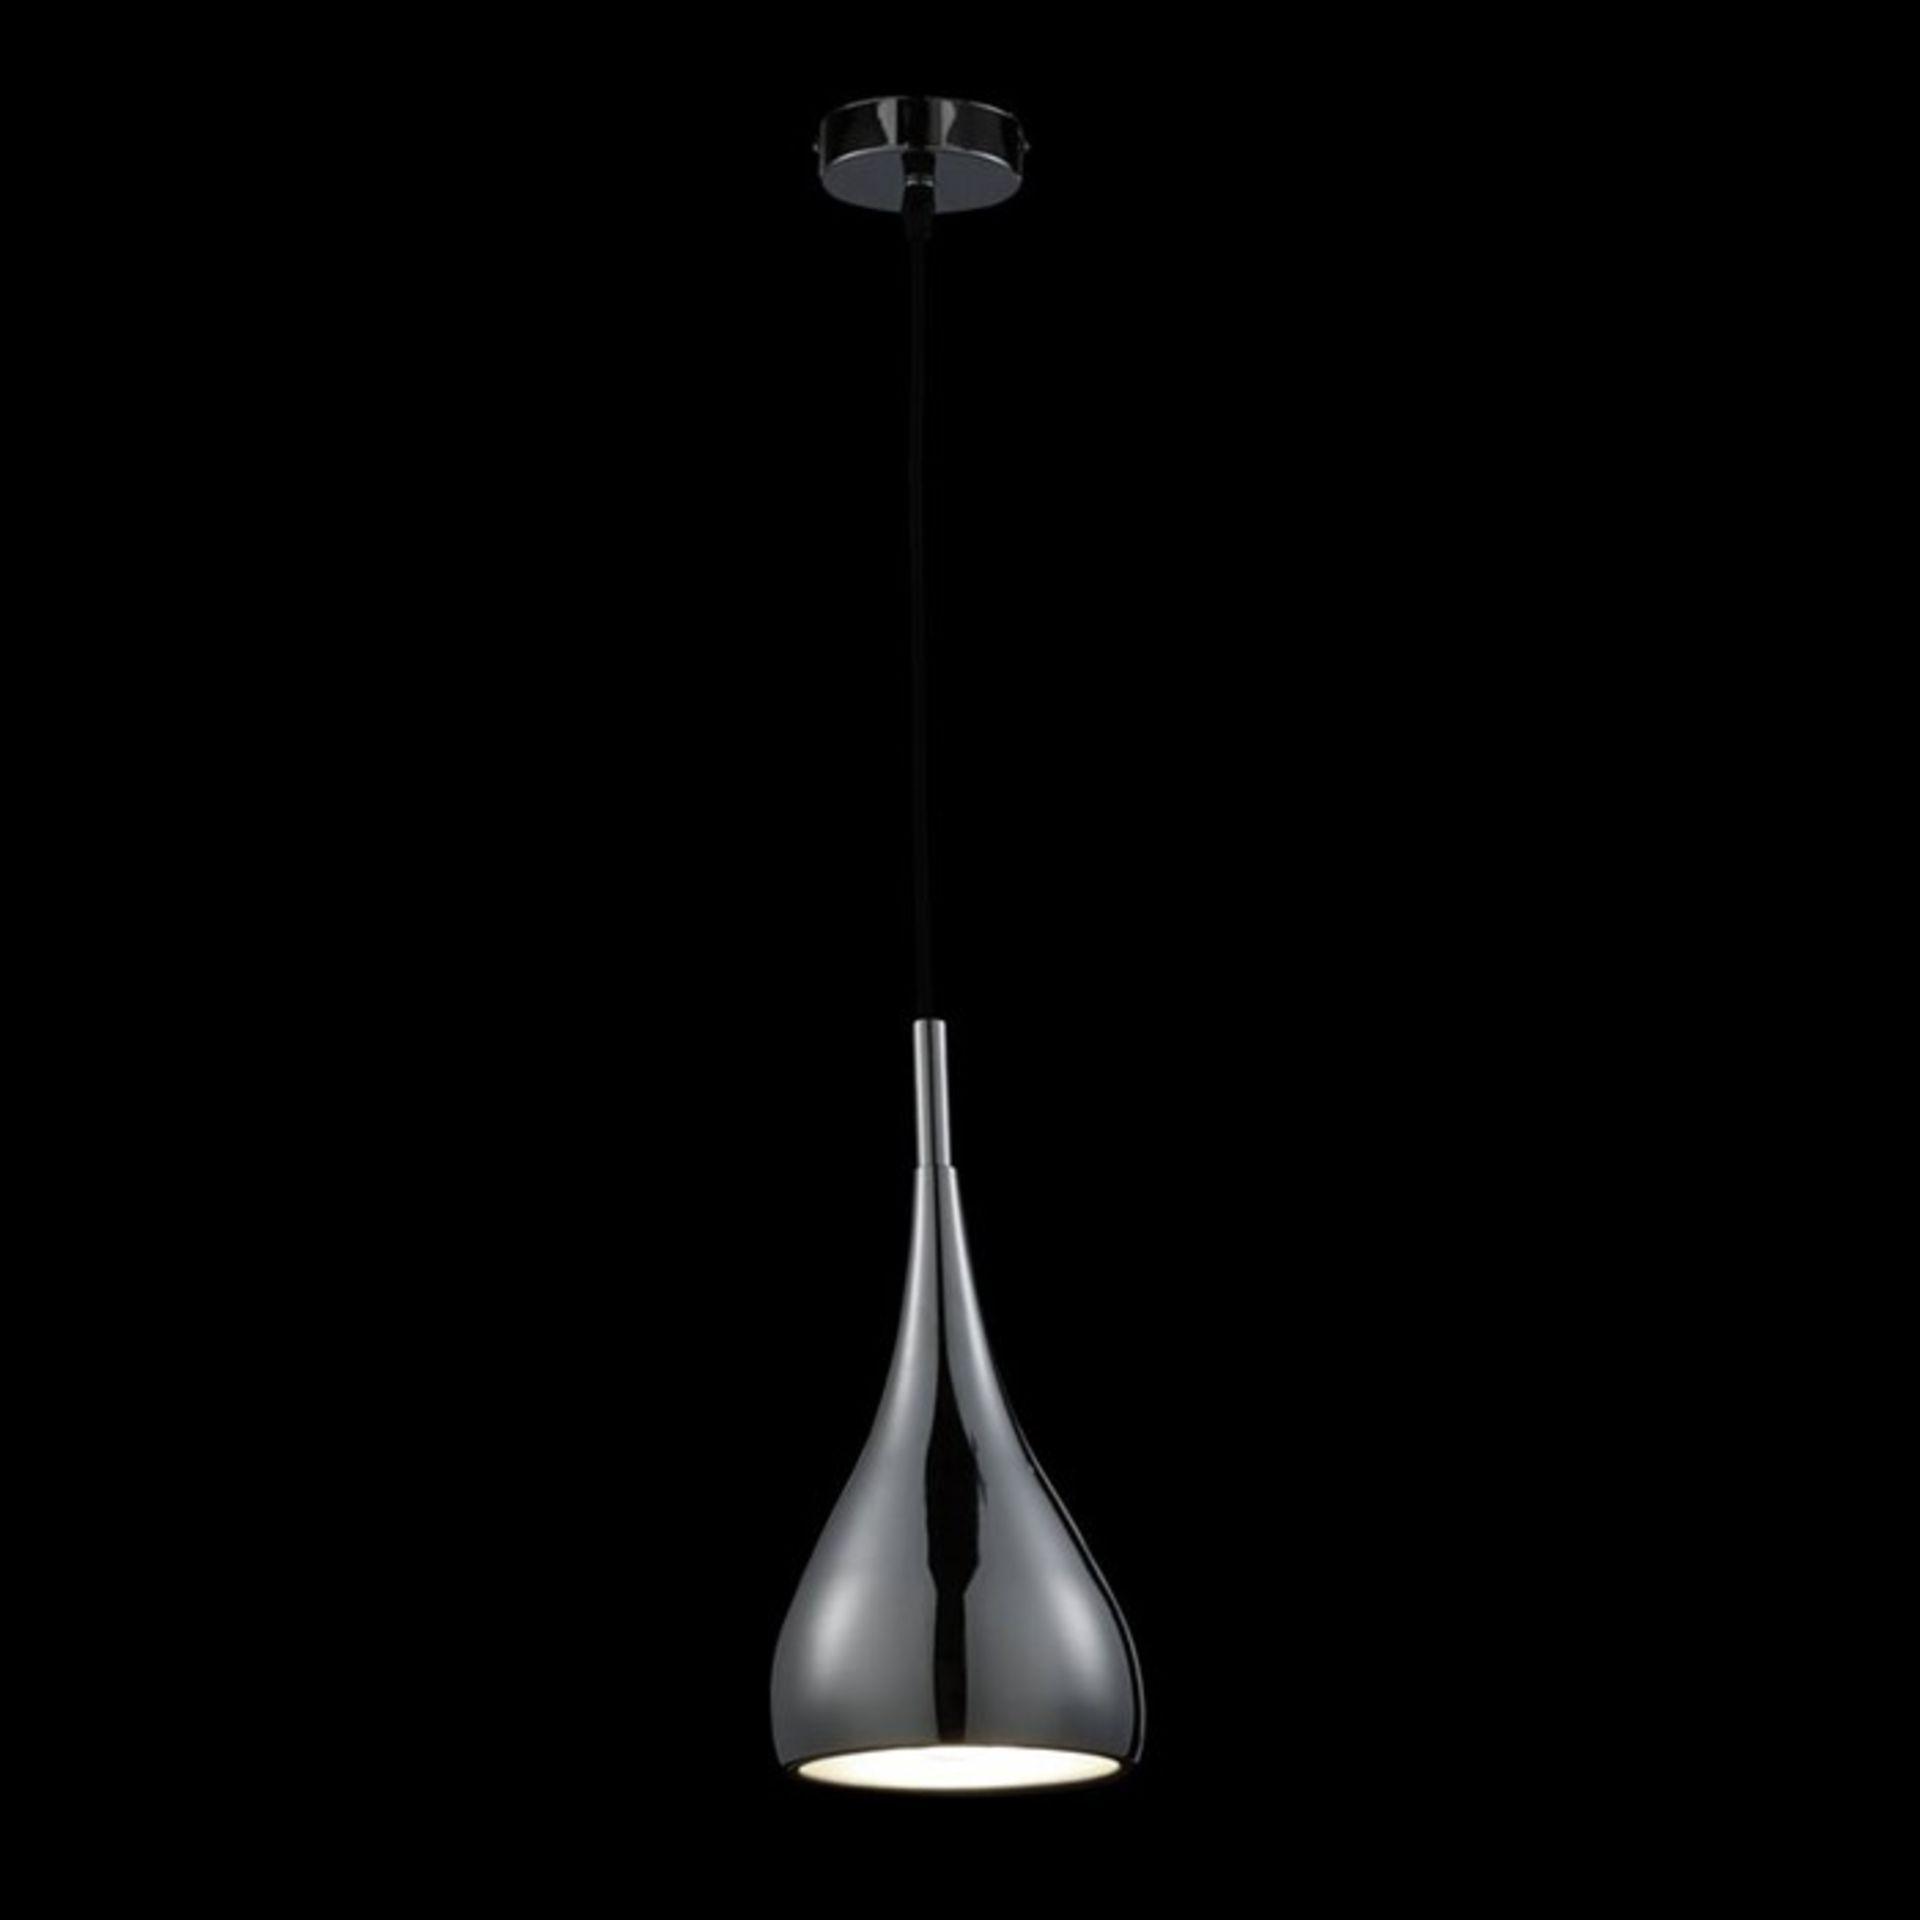 Wrought Studio, Heider 1-Light Teardrop Pendant - RRP £92.49 (NAVE4258 - 13943/29) 7G